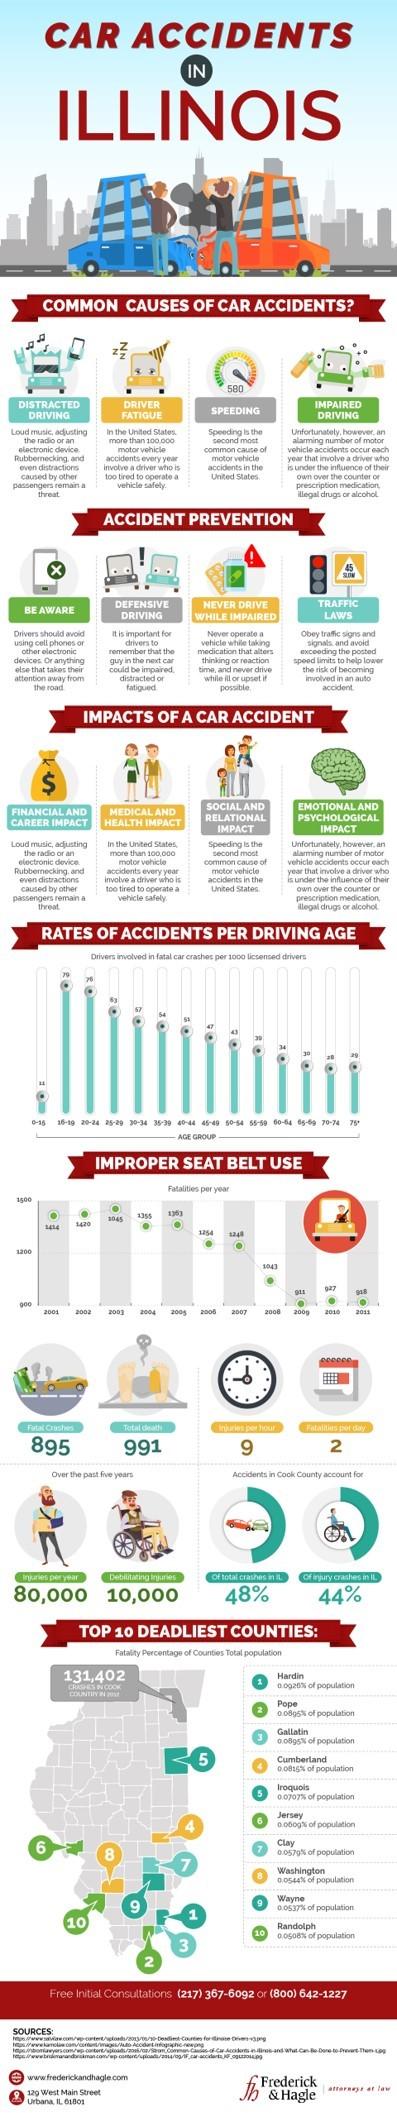 Champaign-Urbana Motor Vehicle Accidents Law Blog | Frederick & Hagle